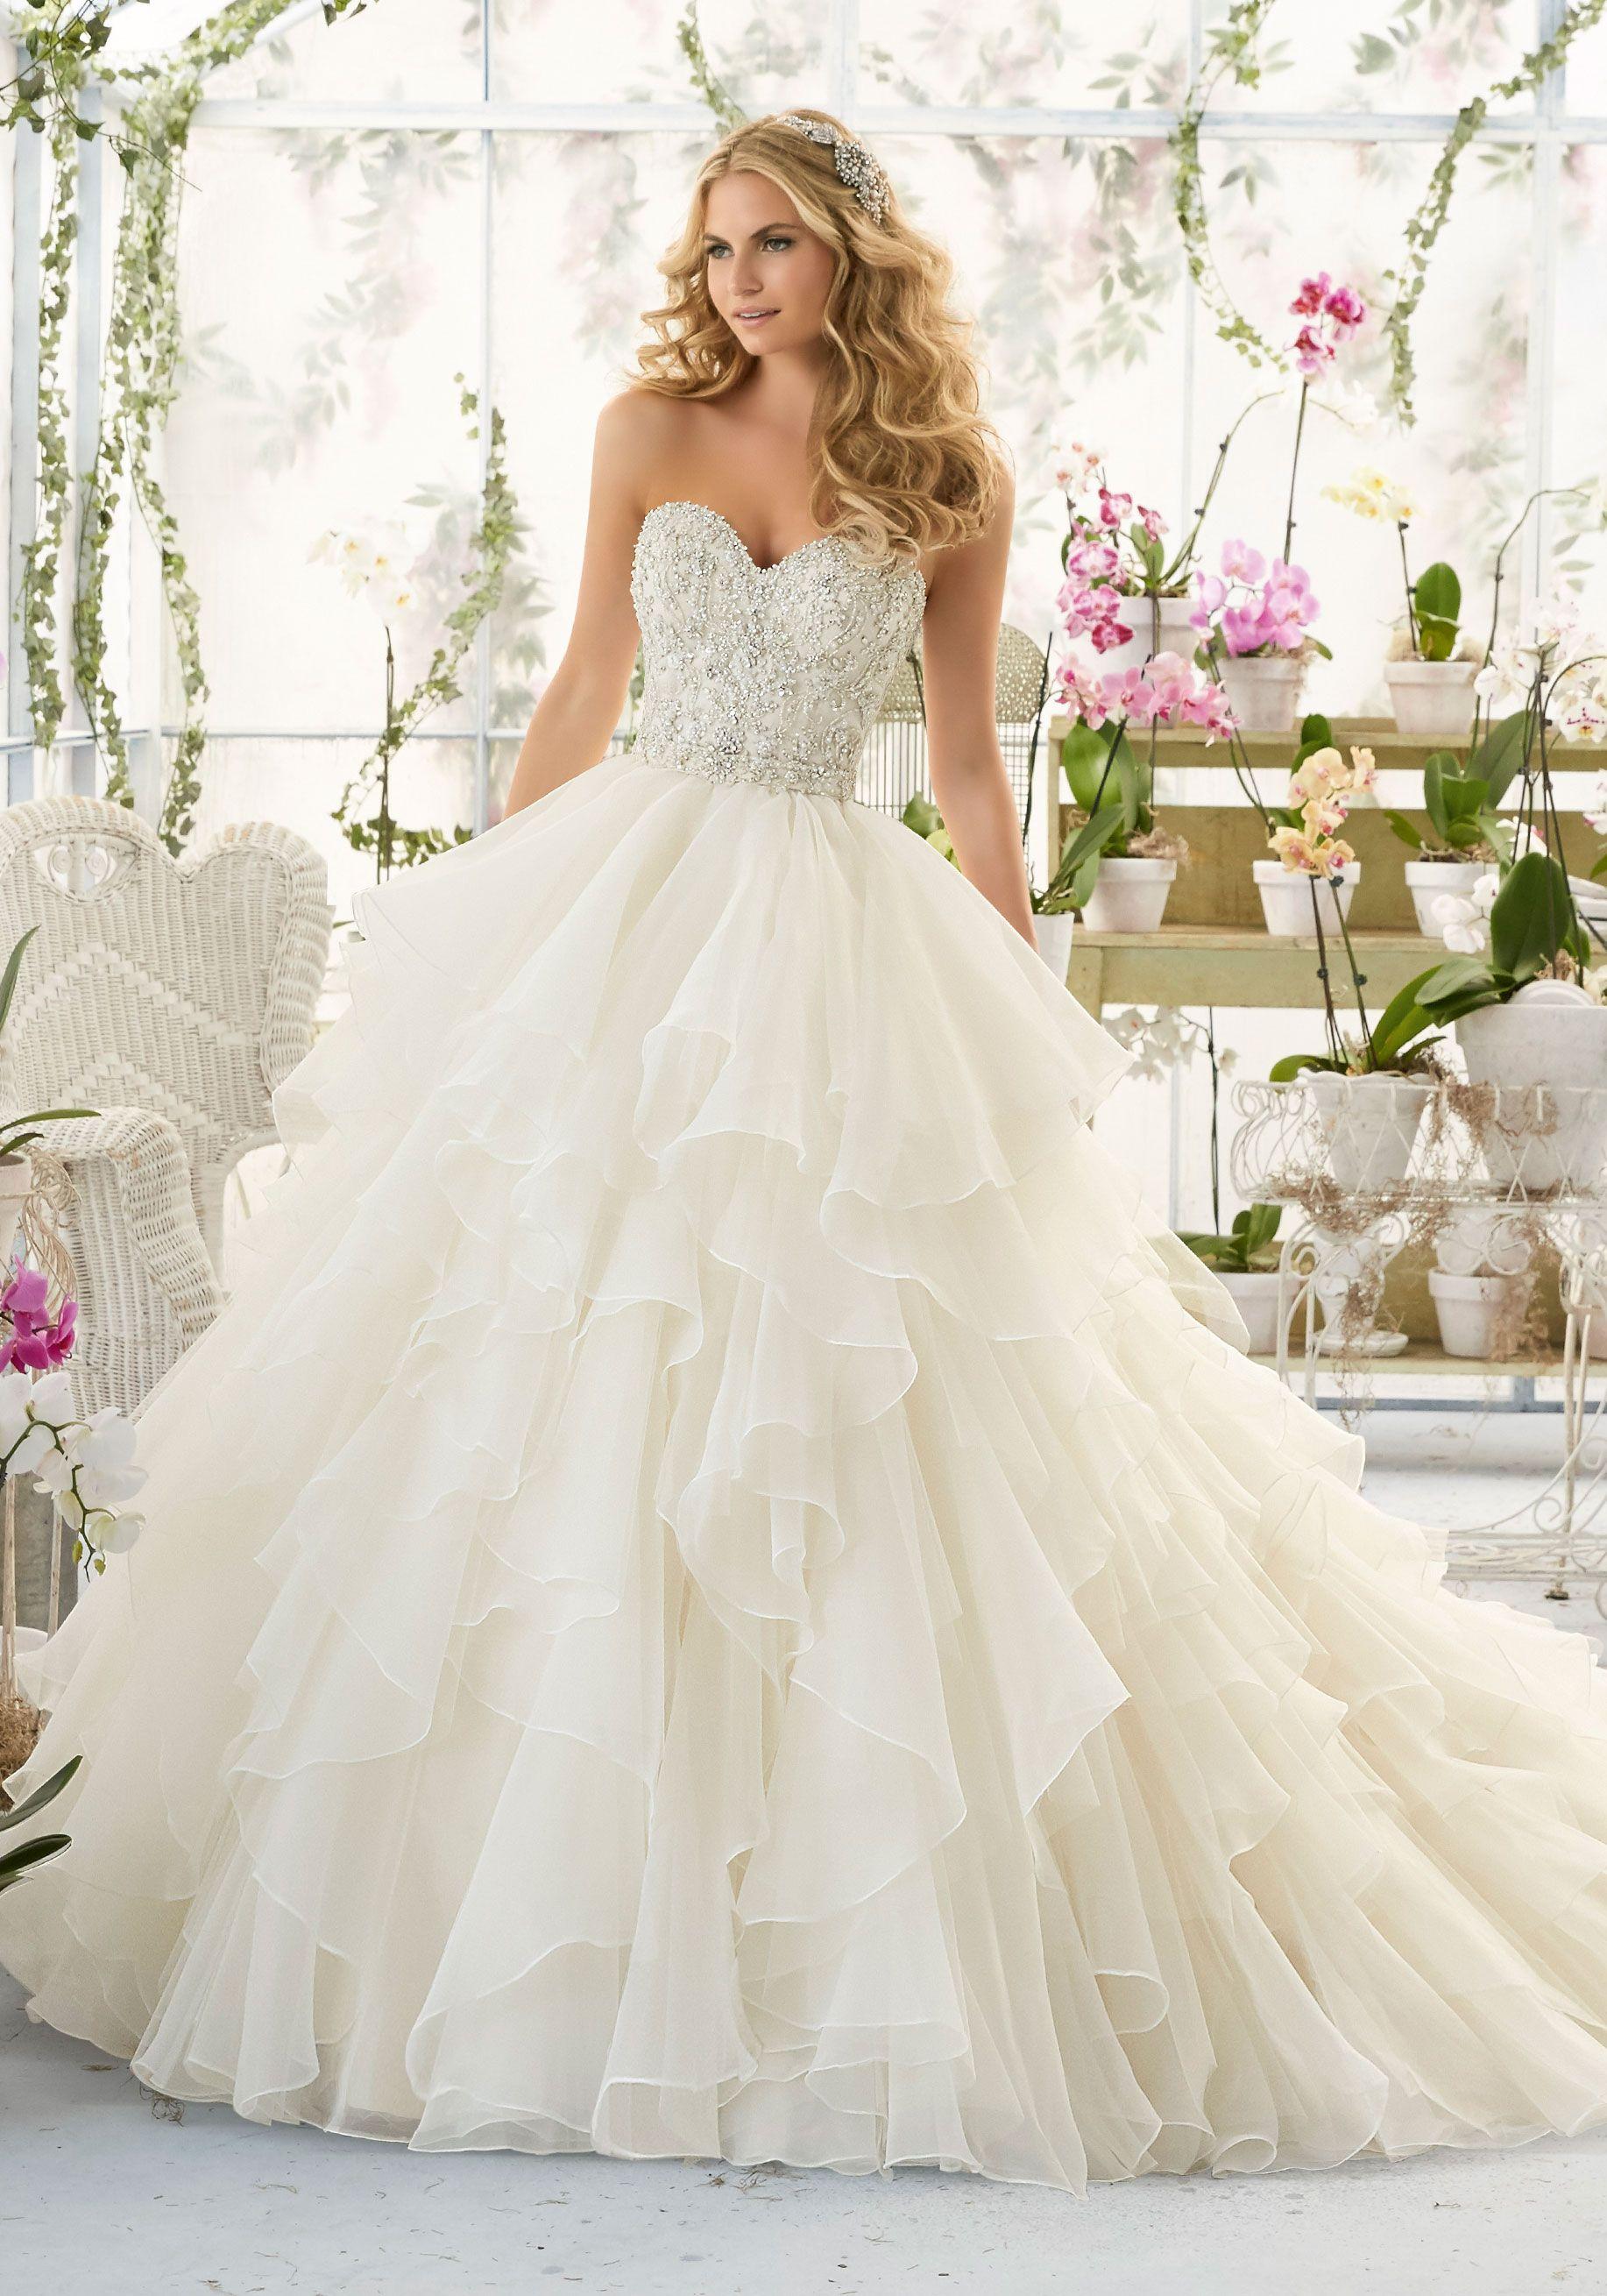 Wedding Dress With Crystal Bodice On Organza Morilee Ball Gowns Wedding Dream Wedding Dresses Bridal Wedding Dresses [ 2620 x 1834 Pixel ]